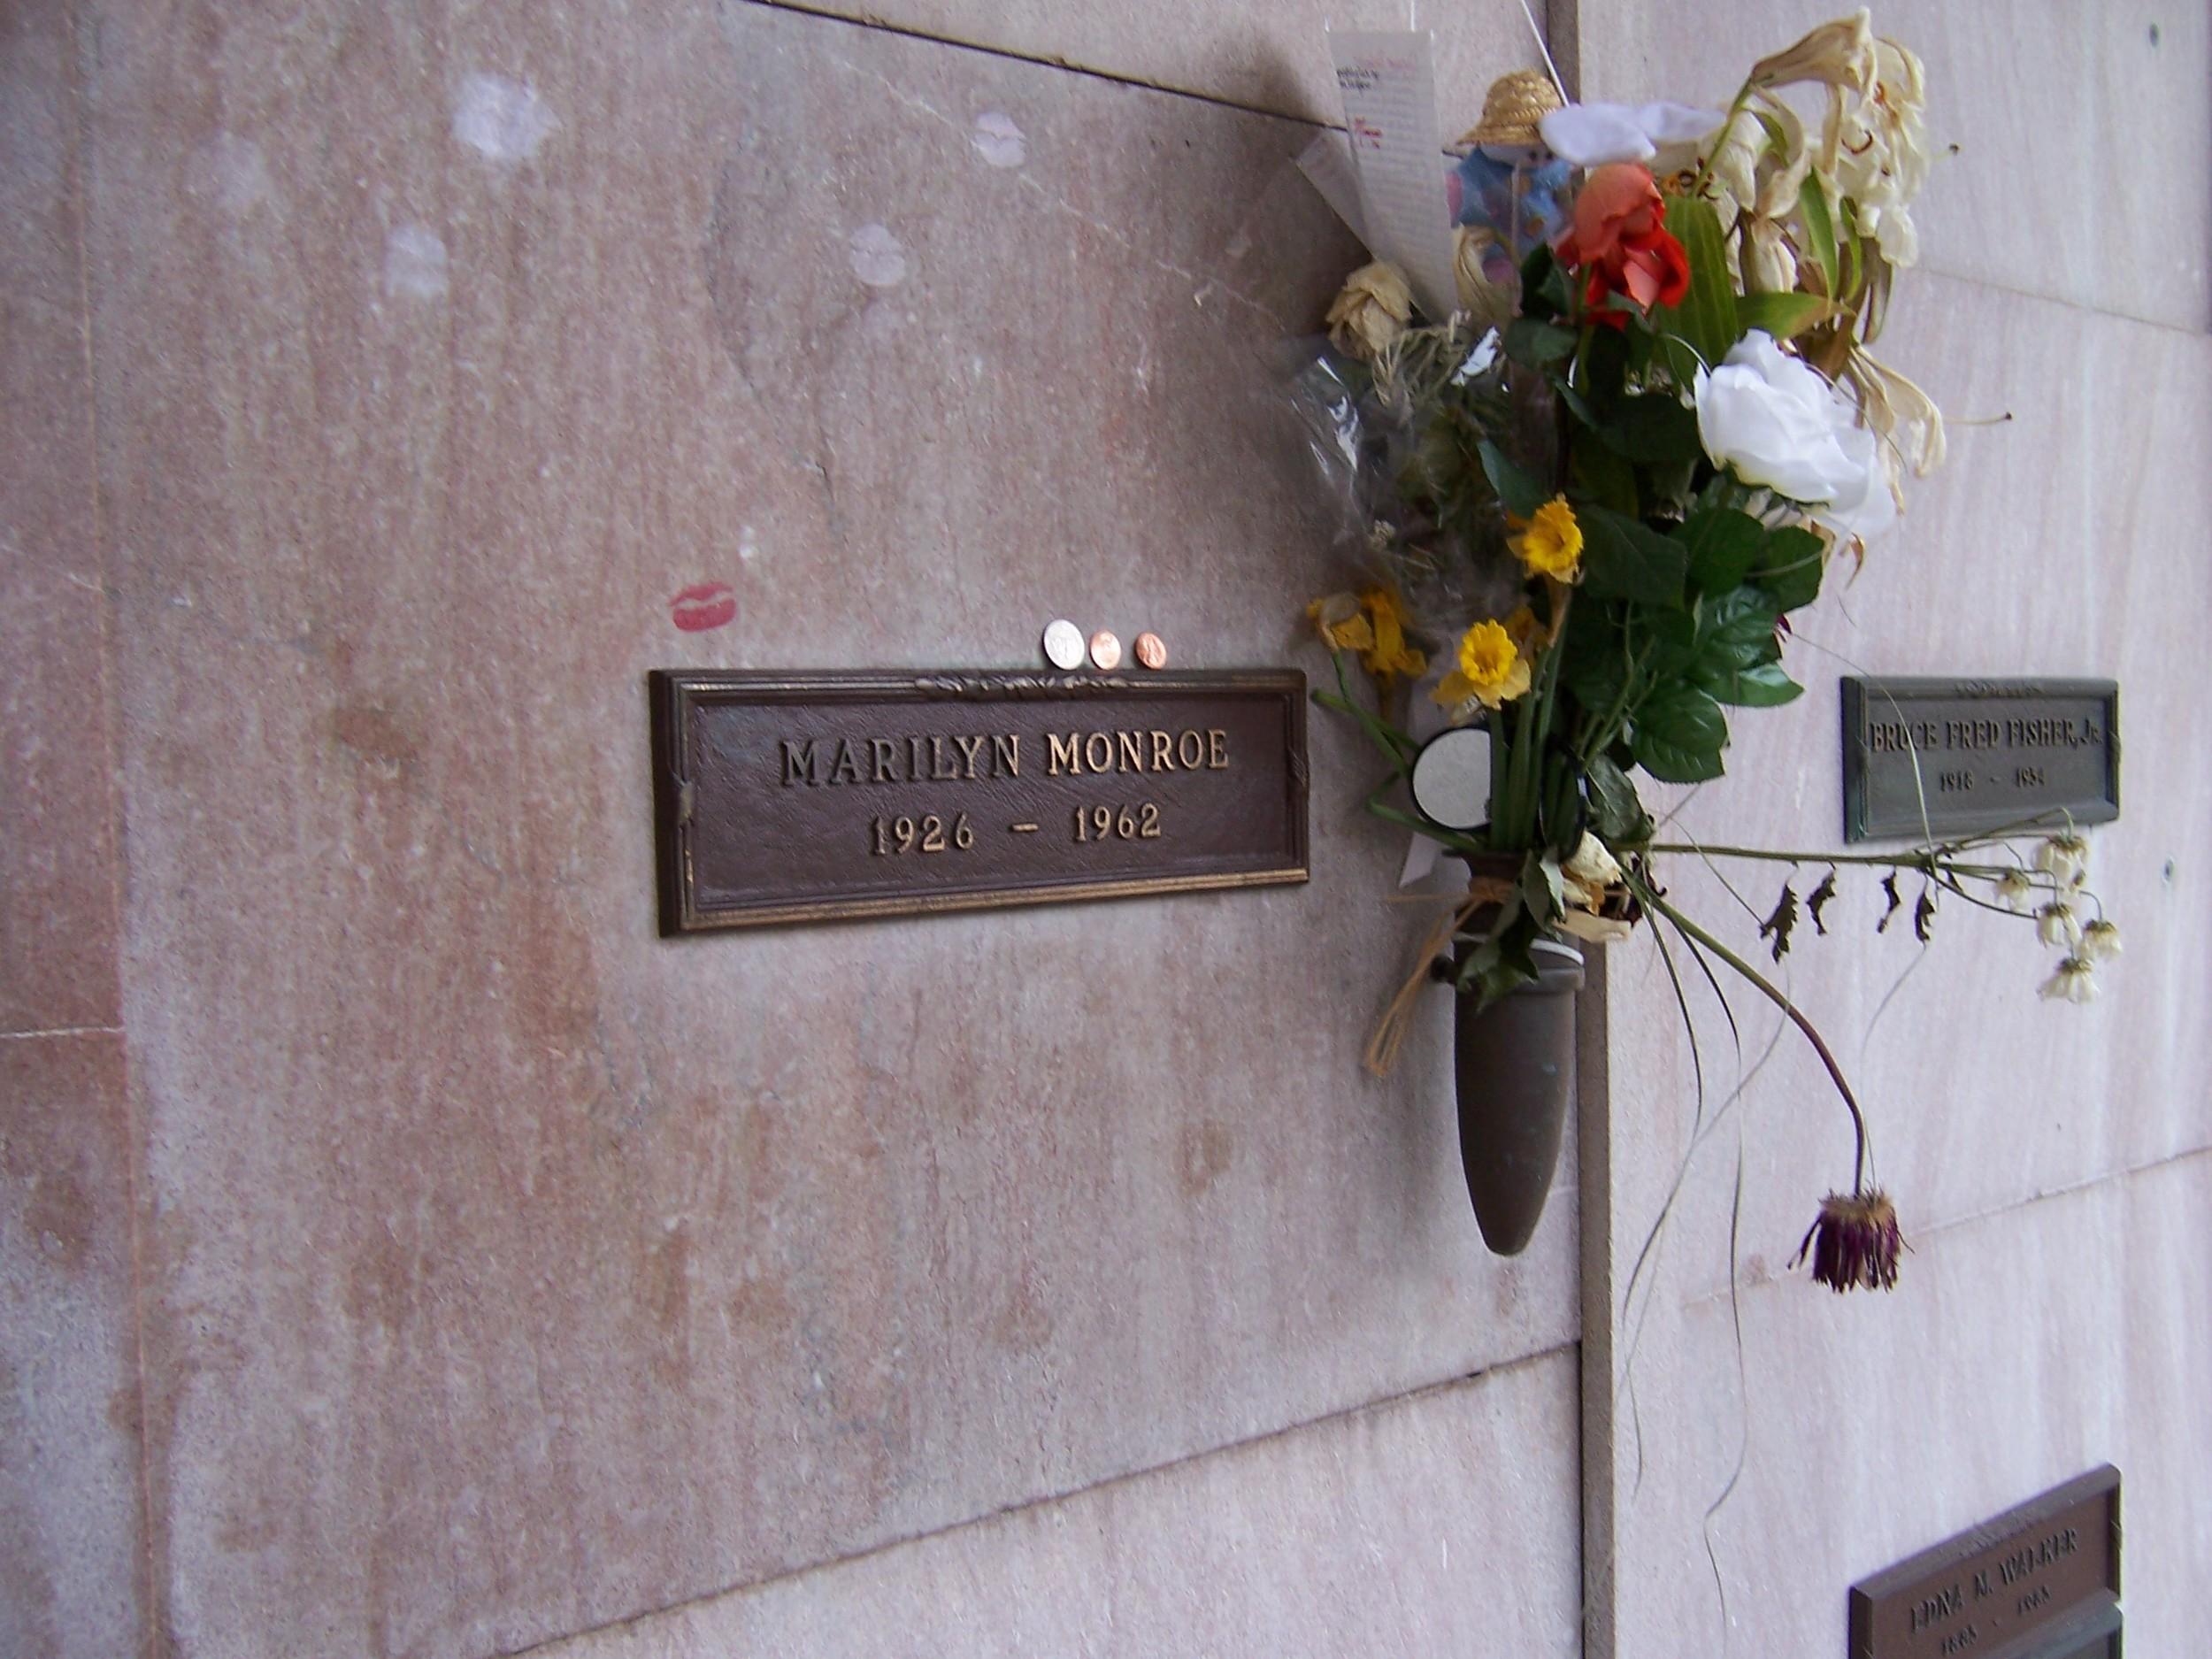 Marilyn Monroe's crypt in Memorial Park Cemetery in Los Angeles, California